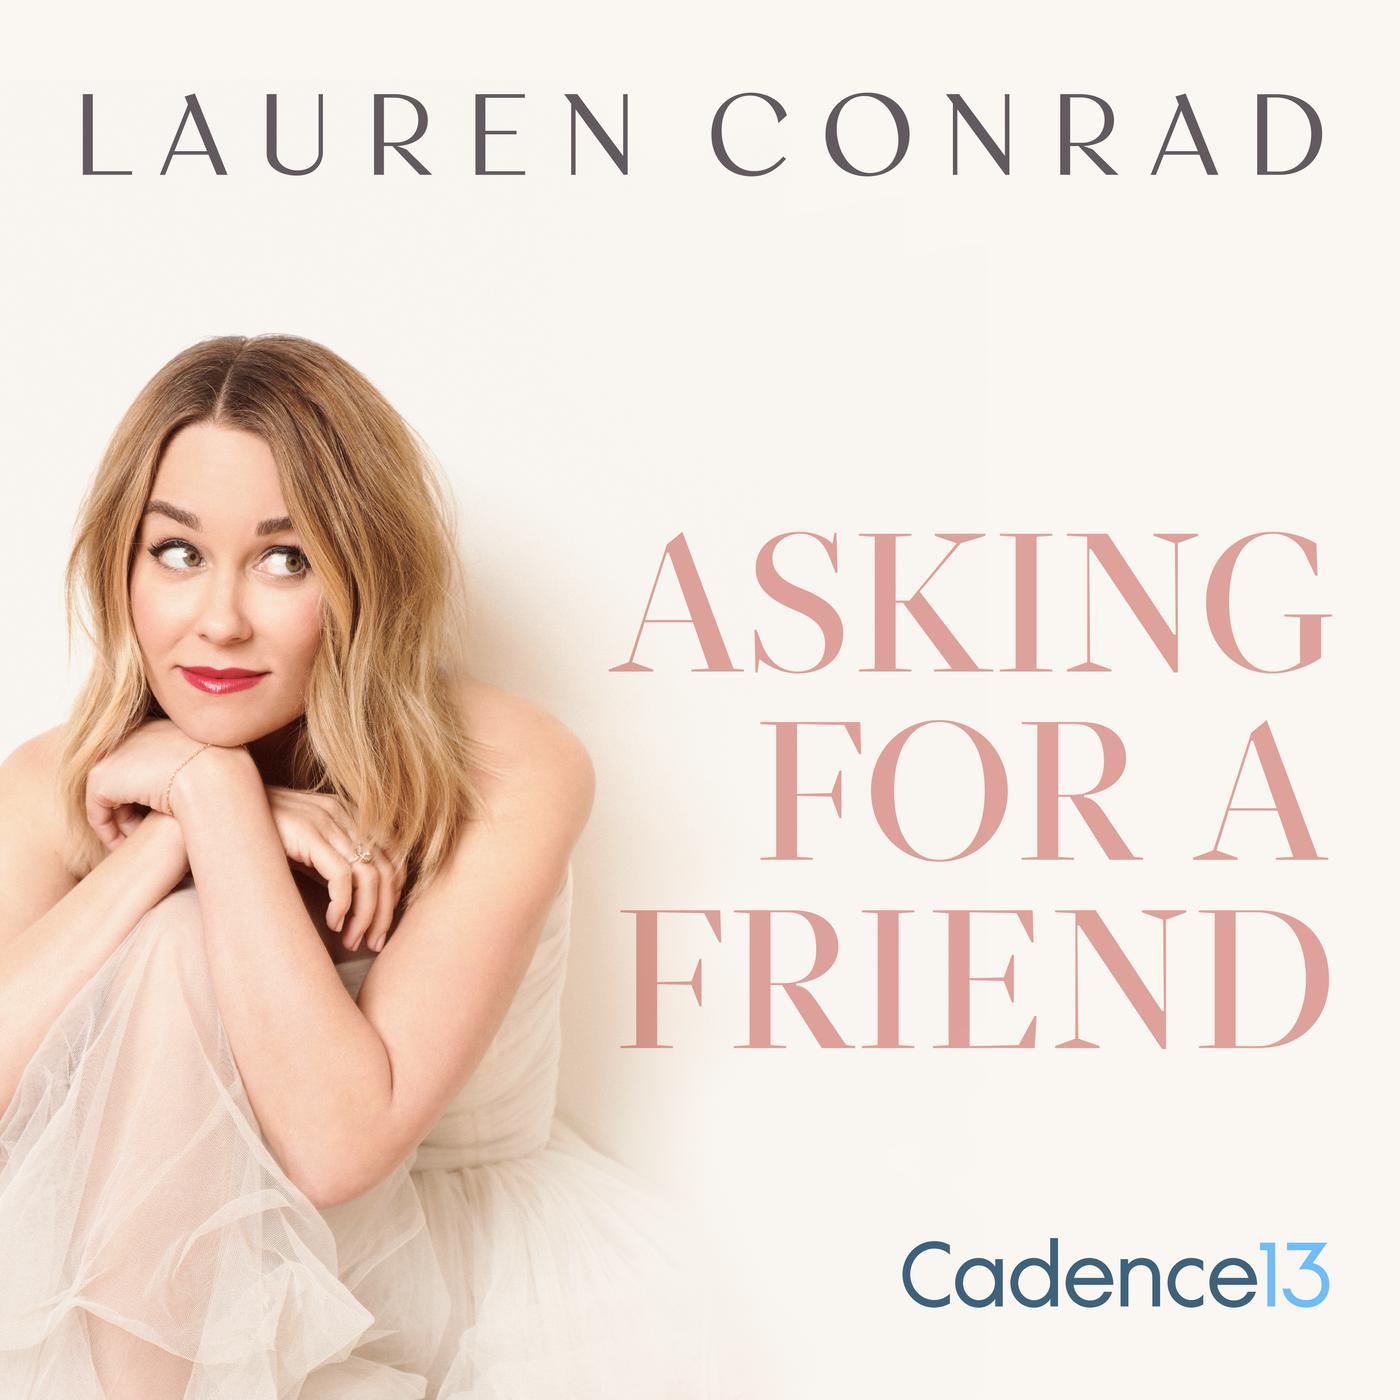 Wie is Lauren Conrad dating radiocarbon dating theorie